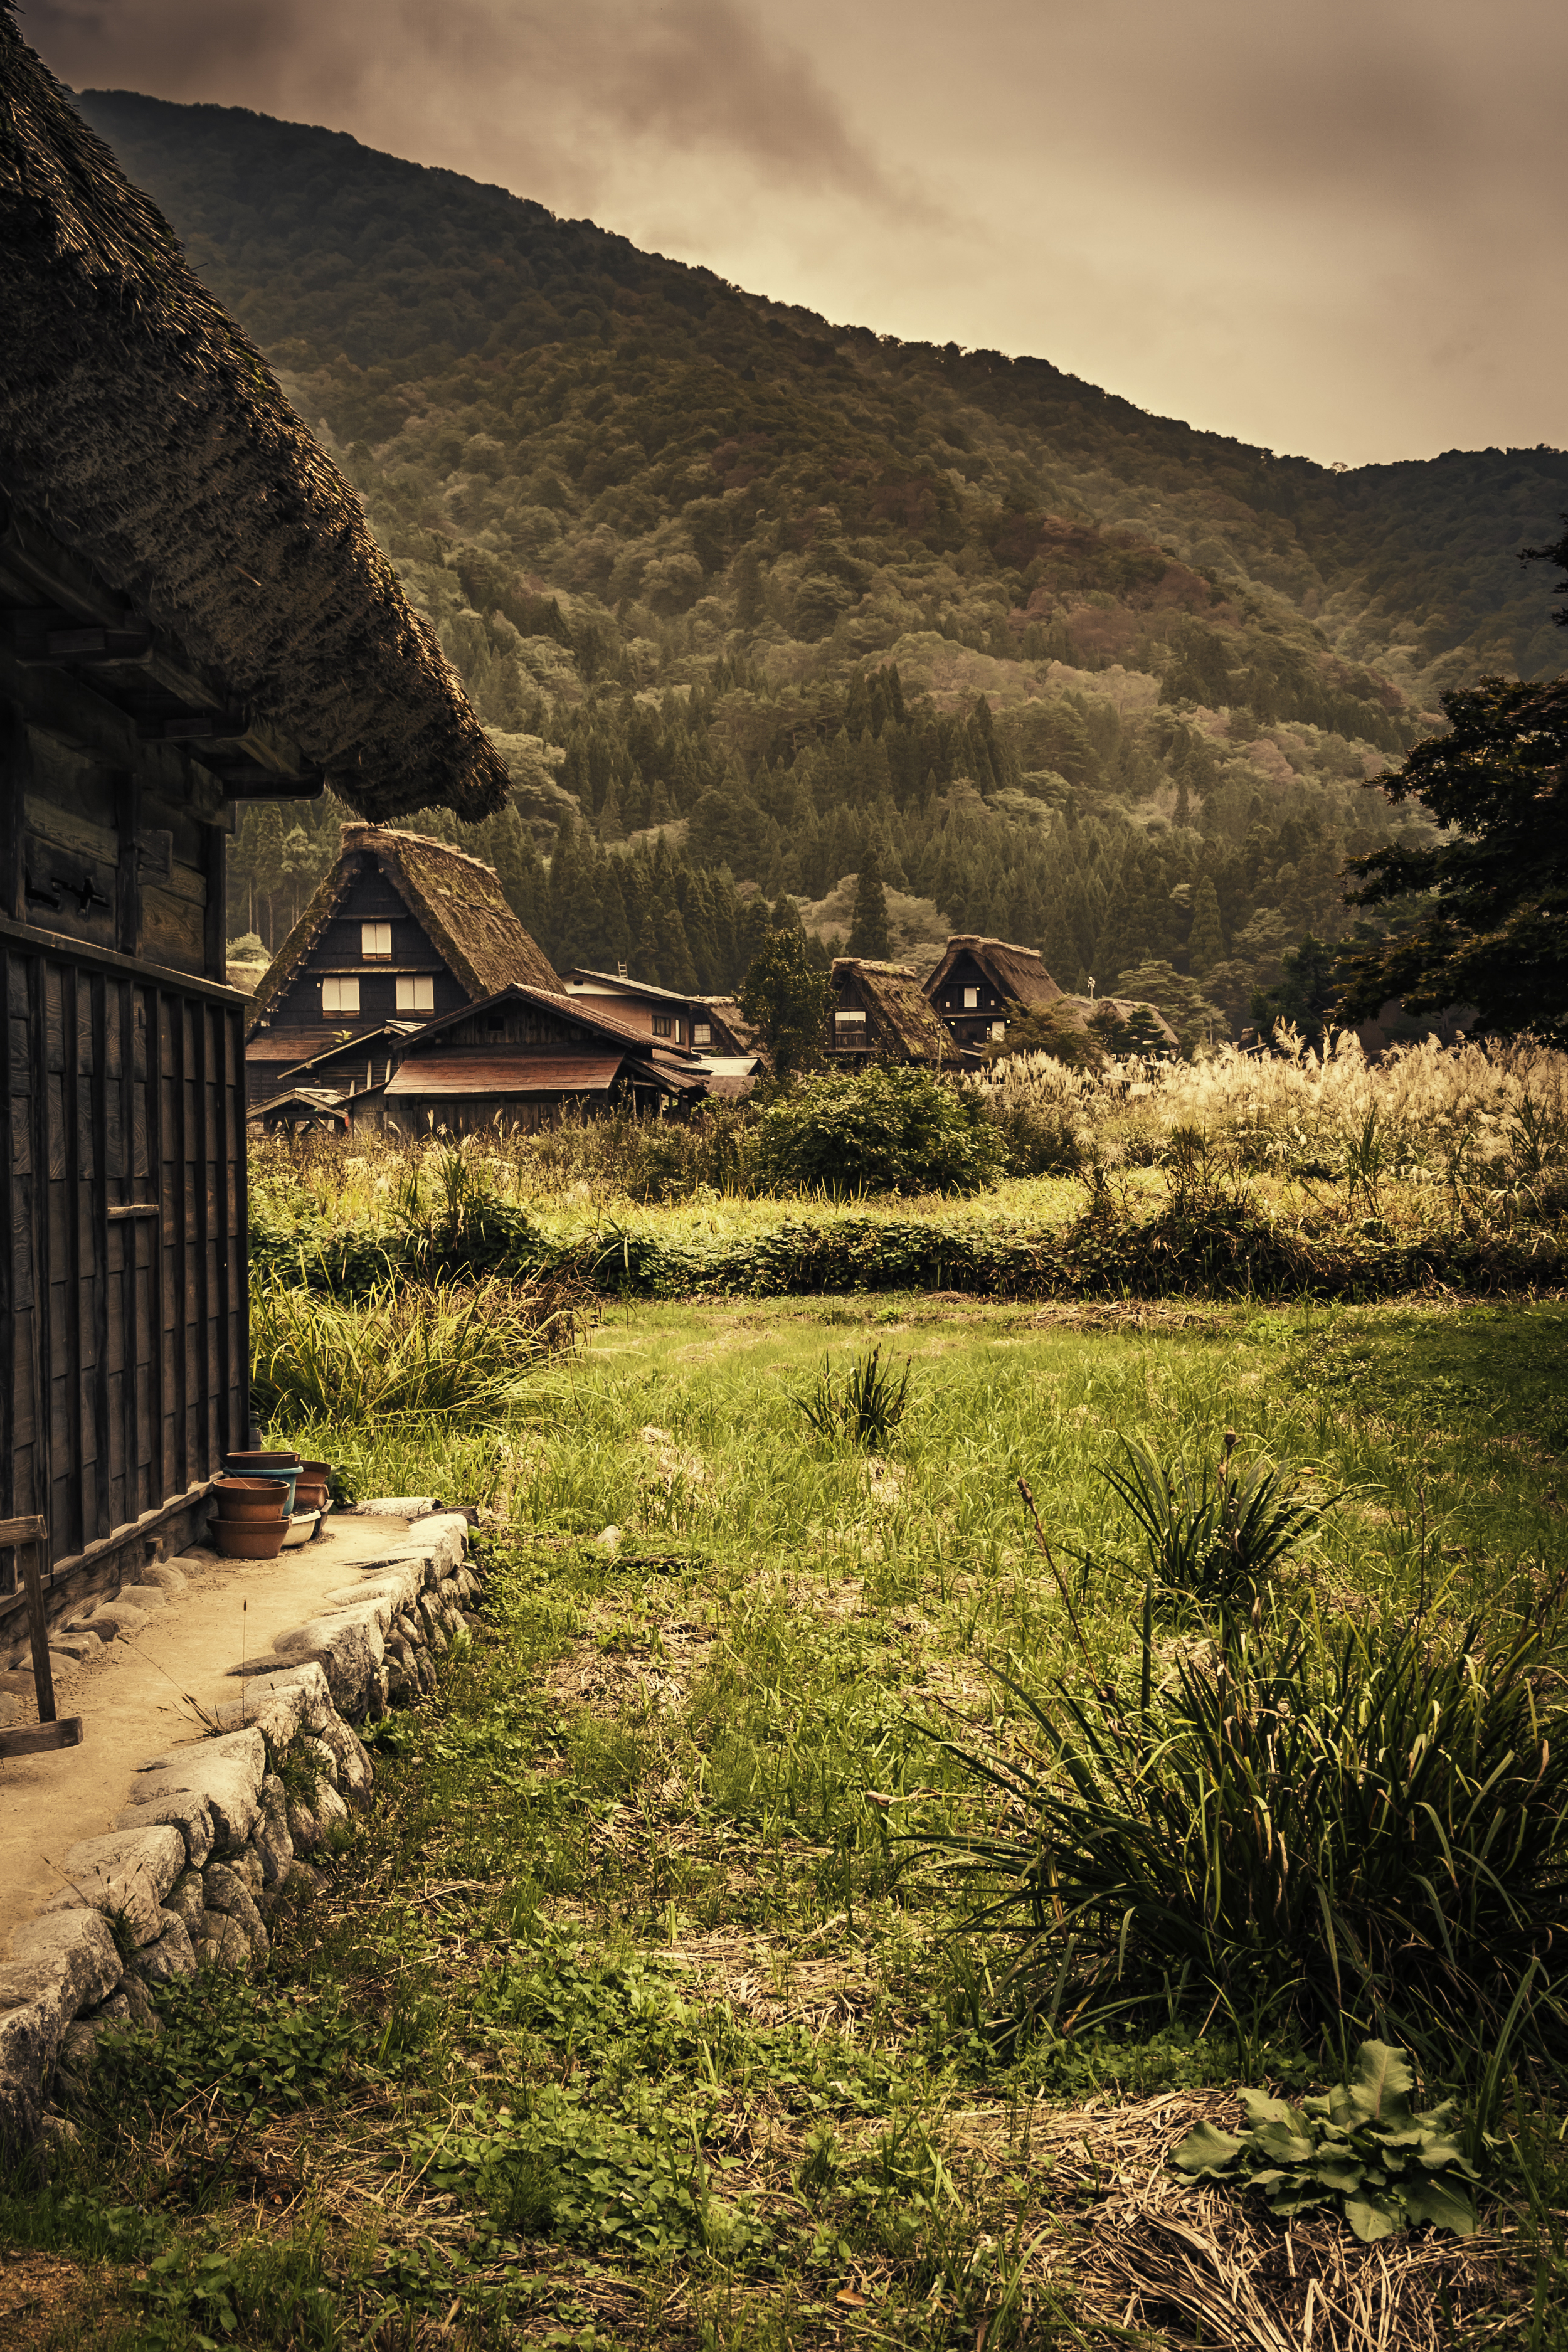 The Gassho-zukuri Houses of Ogimachi Village